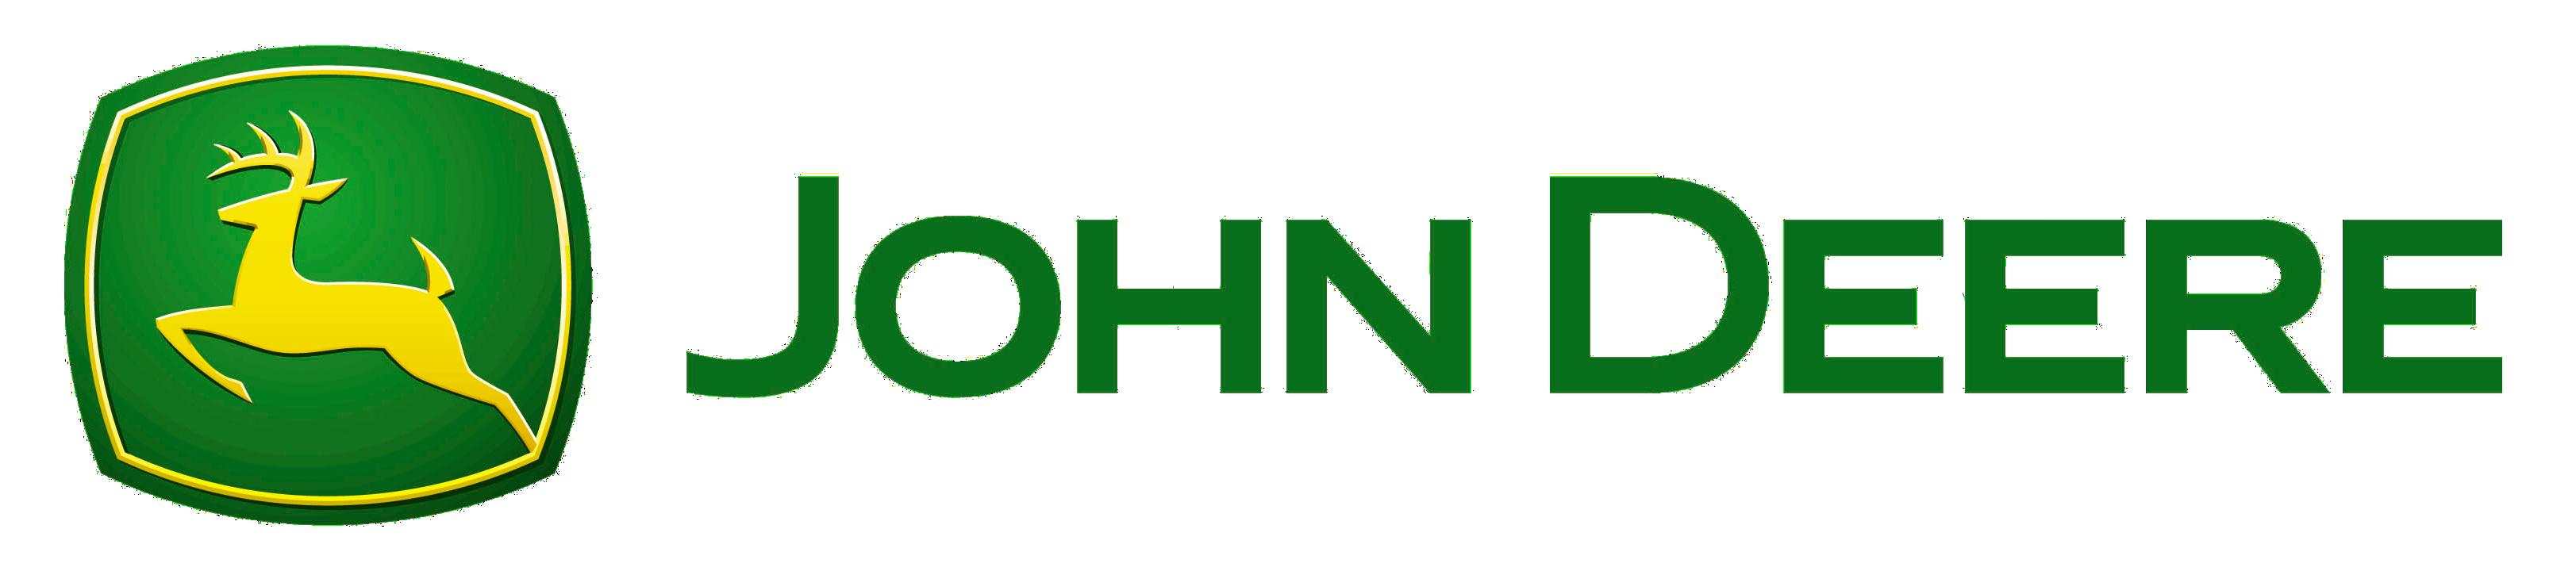 john deere png logo free transparent png logos rh freepnglogos com